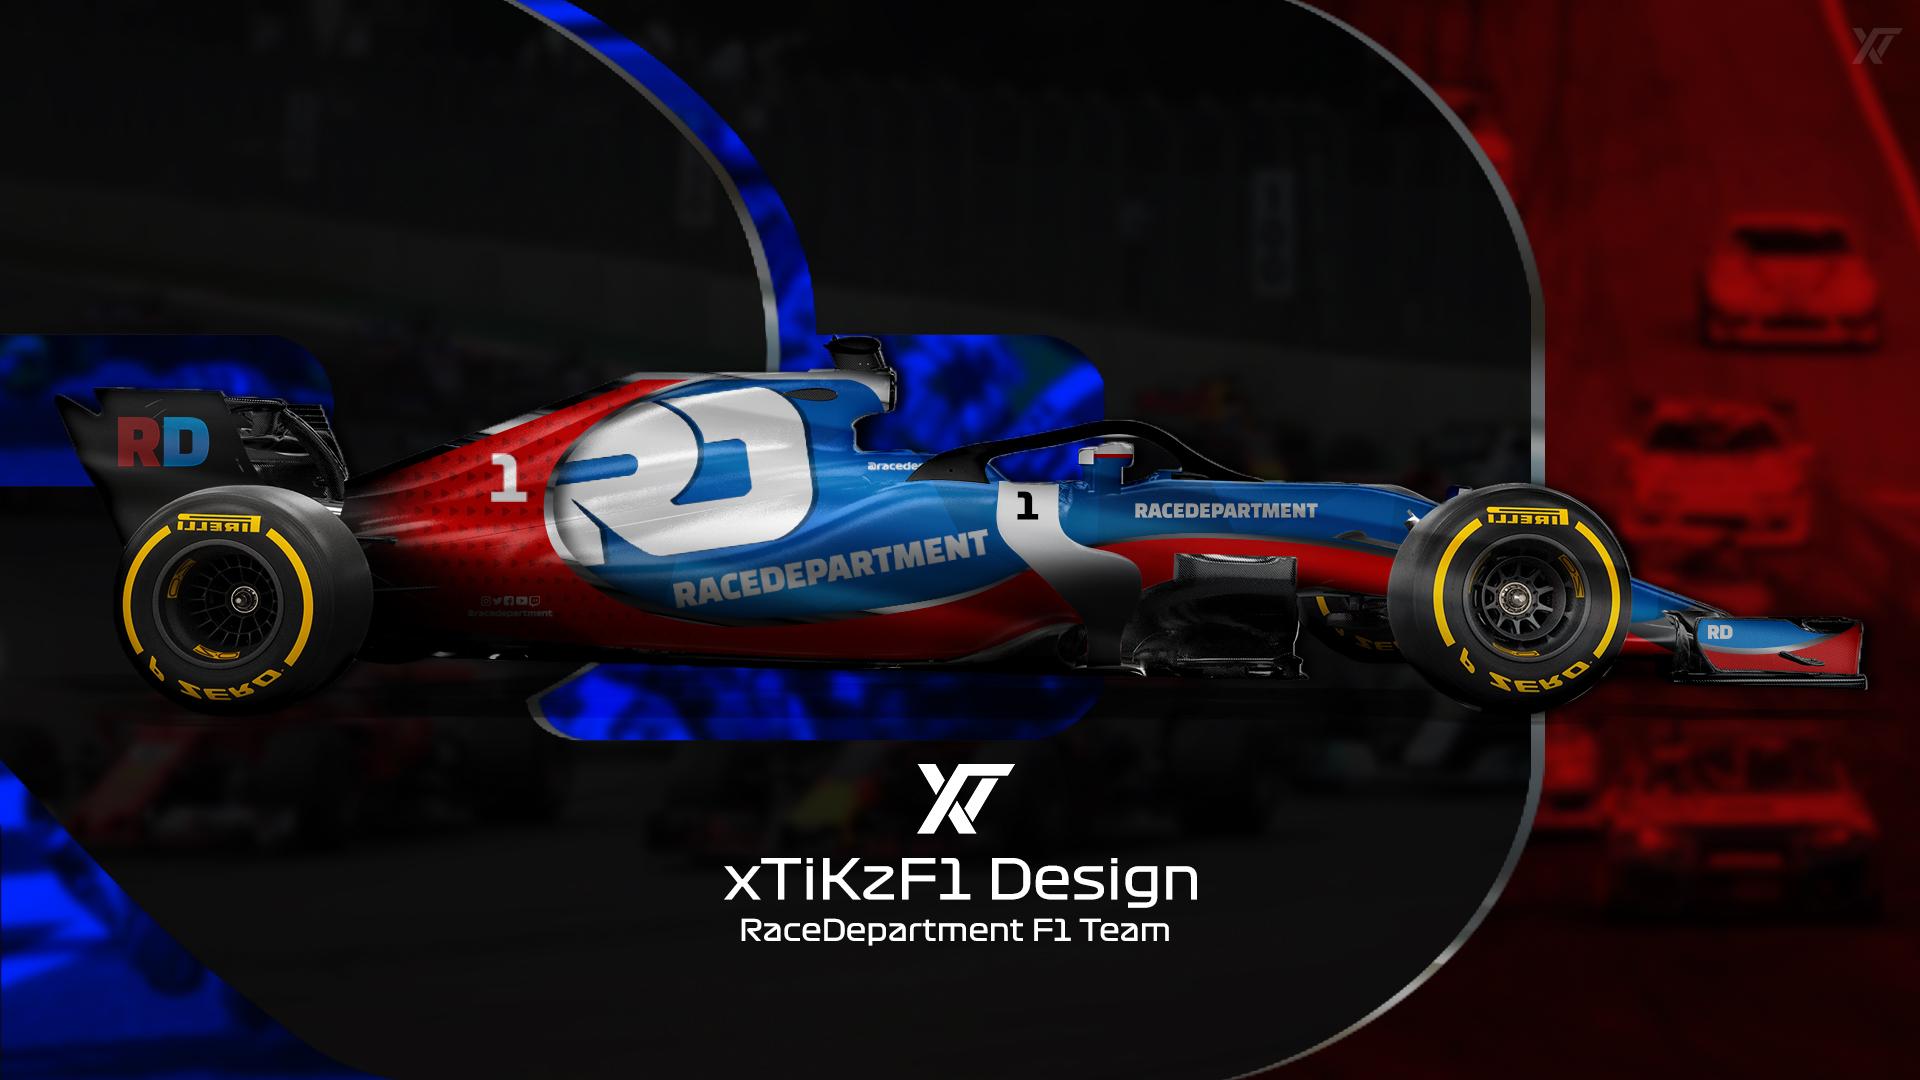 S.56 Design: Corvette C8.R Red Bull Delahaye Racing